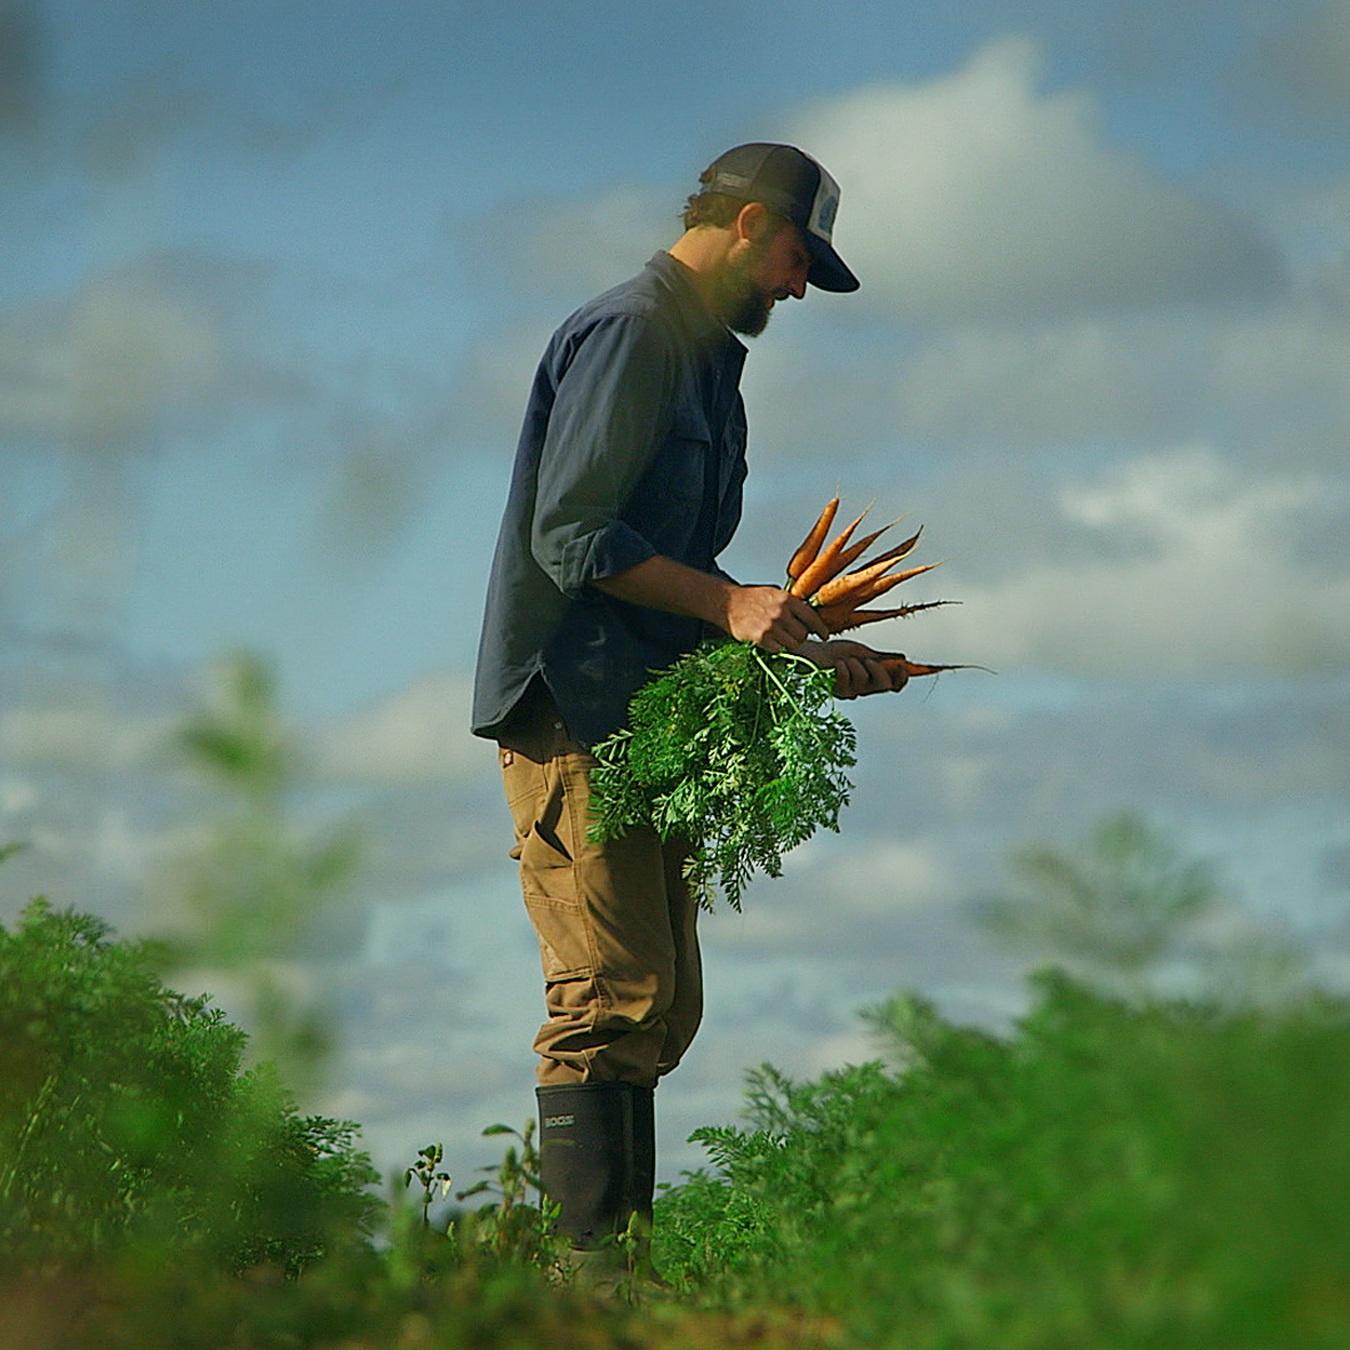 Farmer%27sShortsWEWANT.jpg